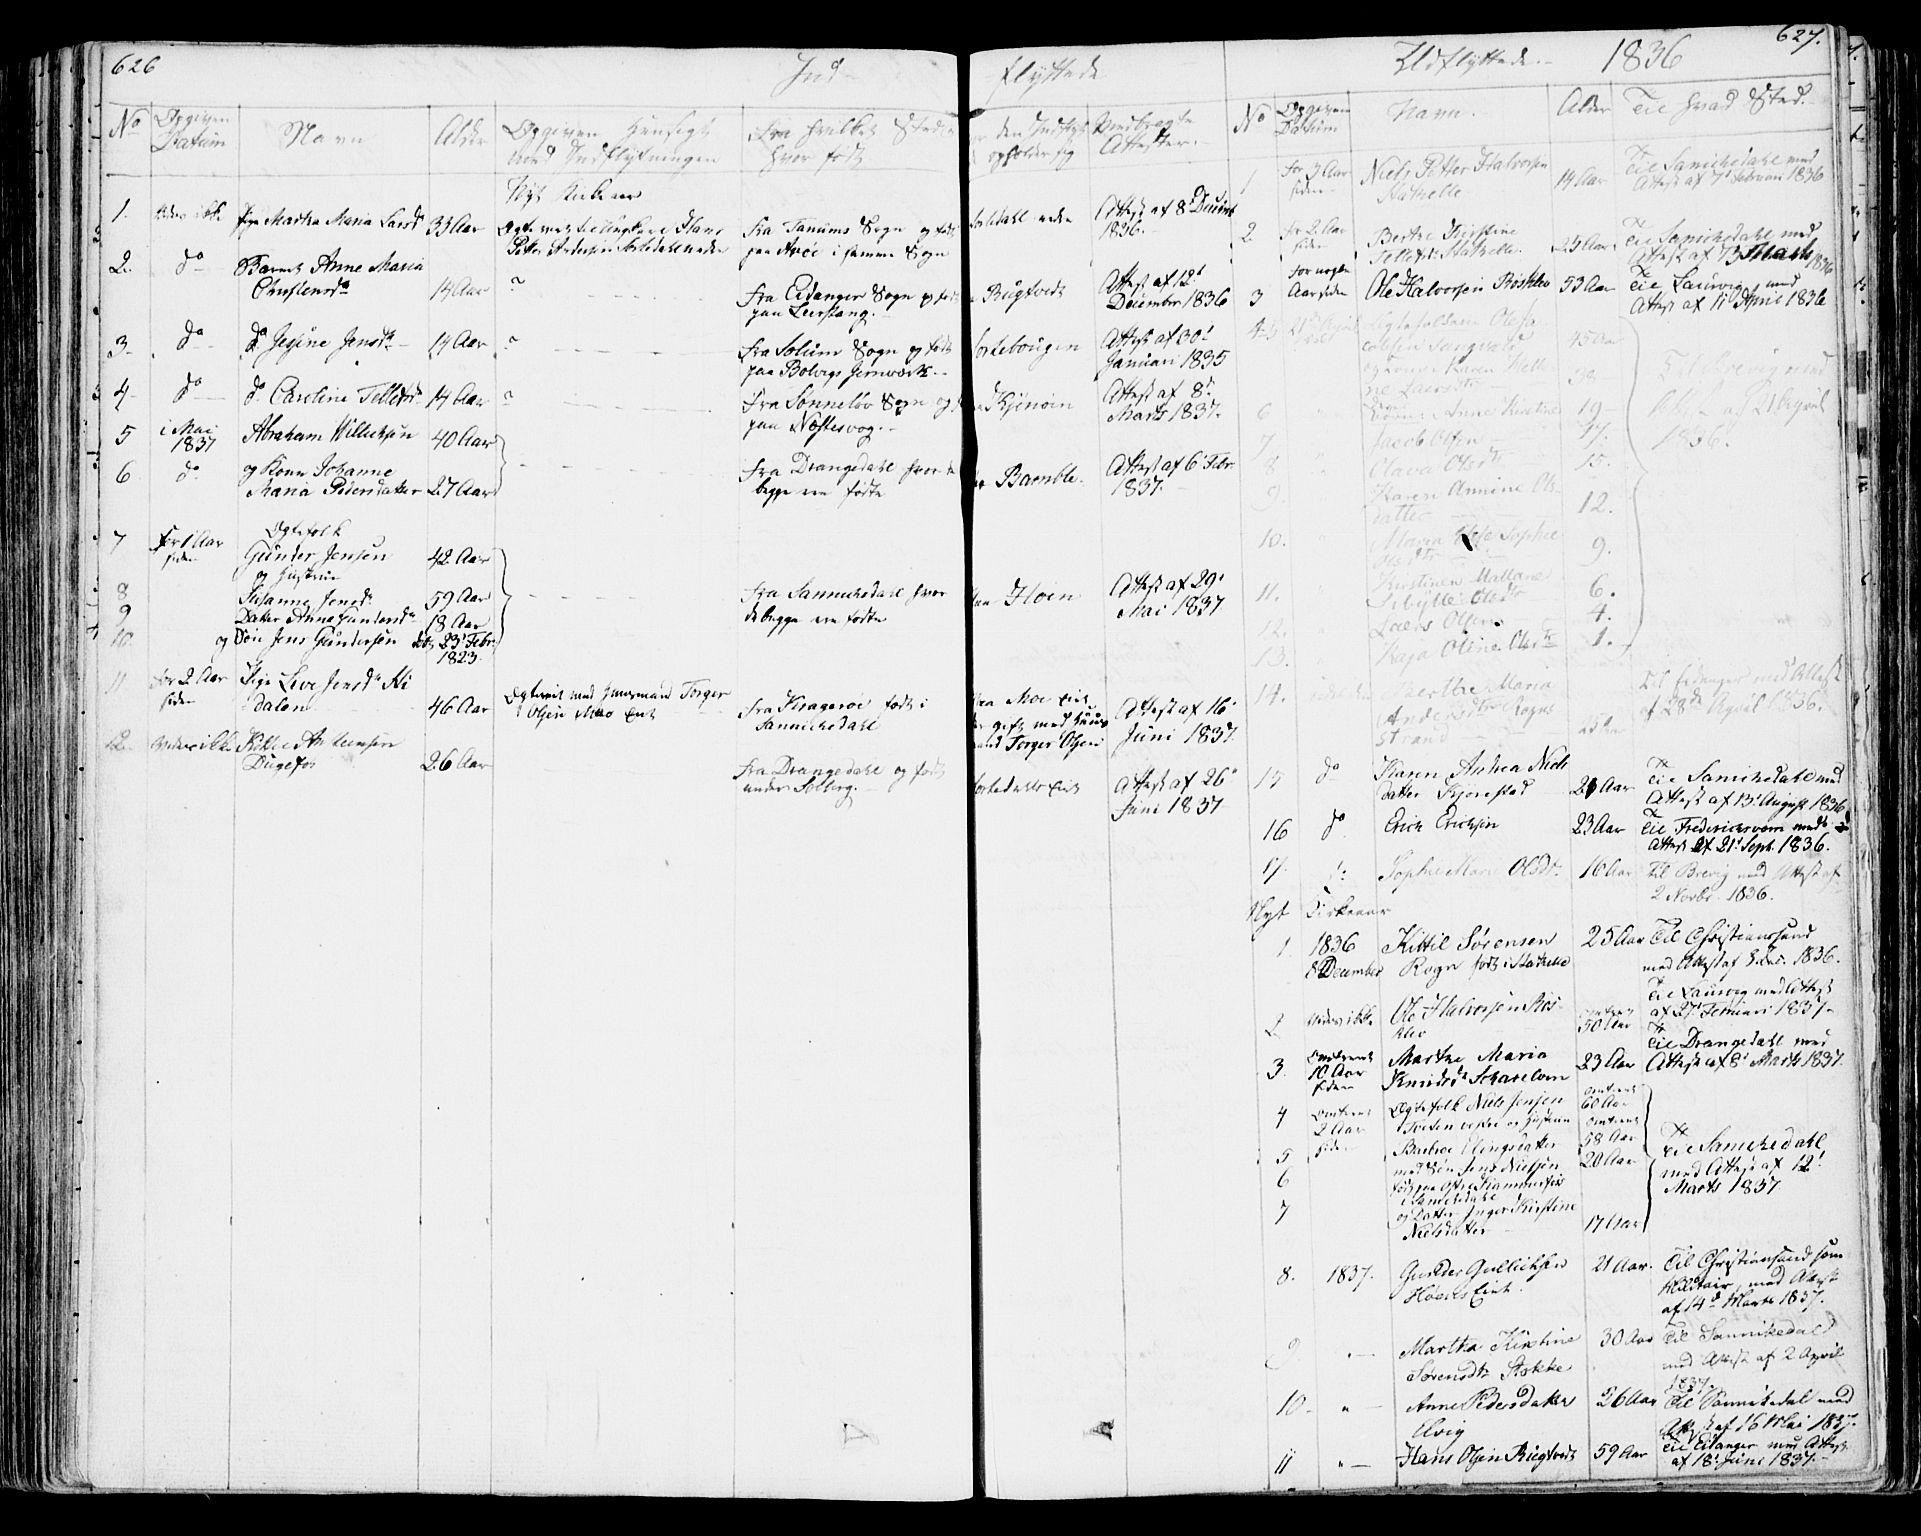 SAKO, Bamble kirkebøker, F/Fa/L0004: Ministerialbok nr. I 4, 1834-1853, s. 626-627